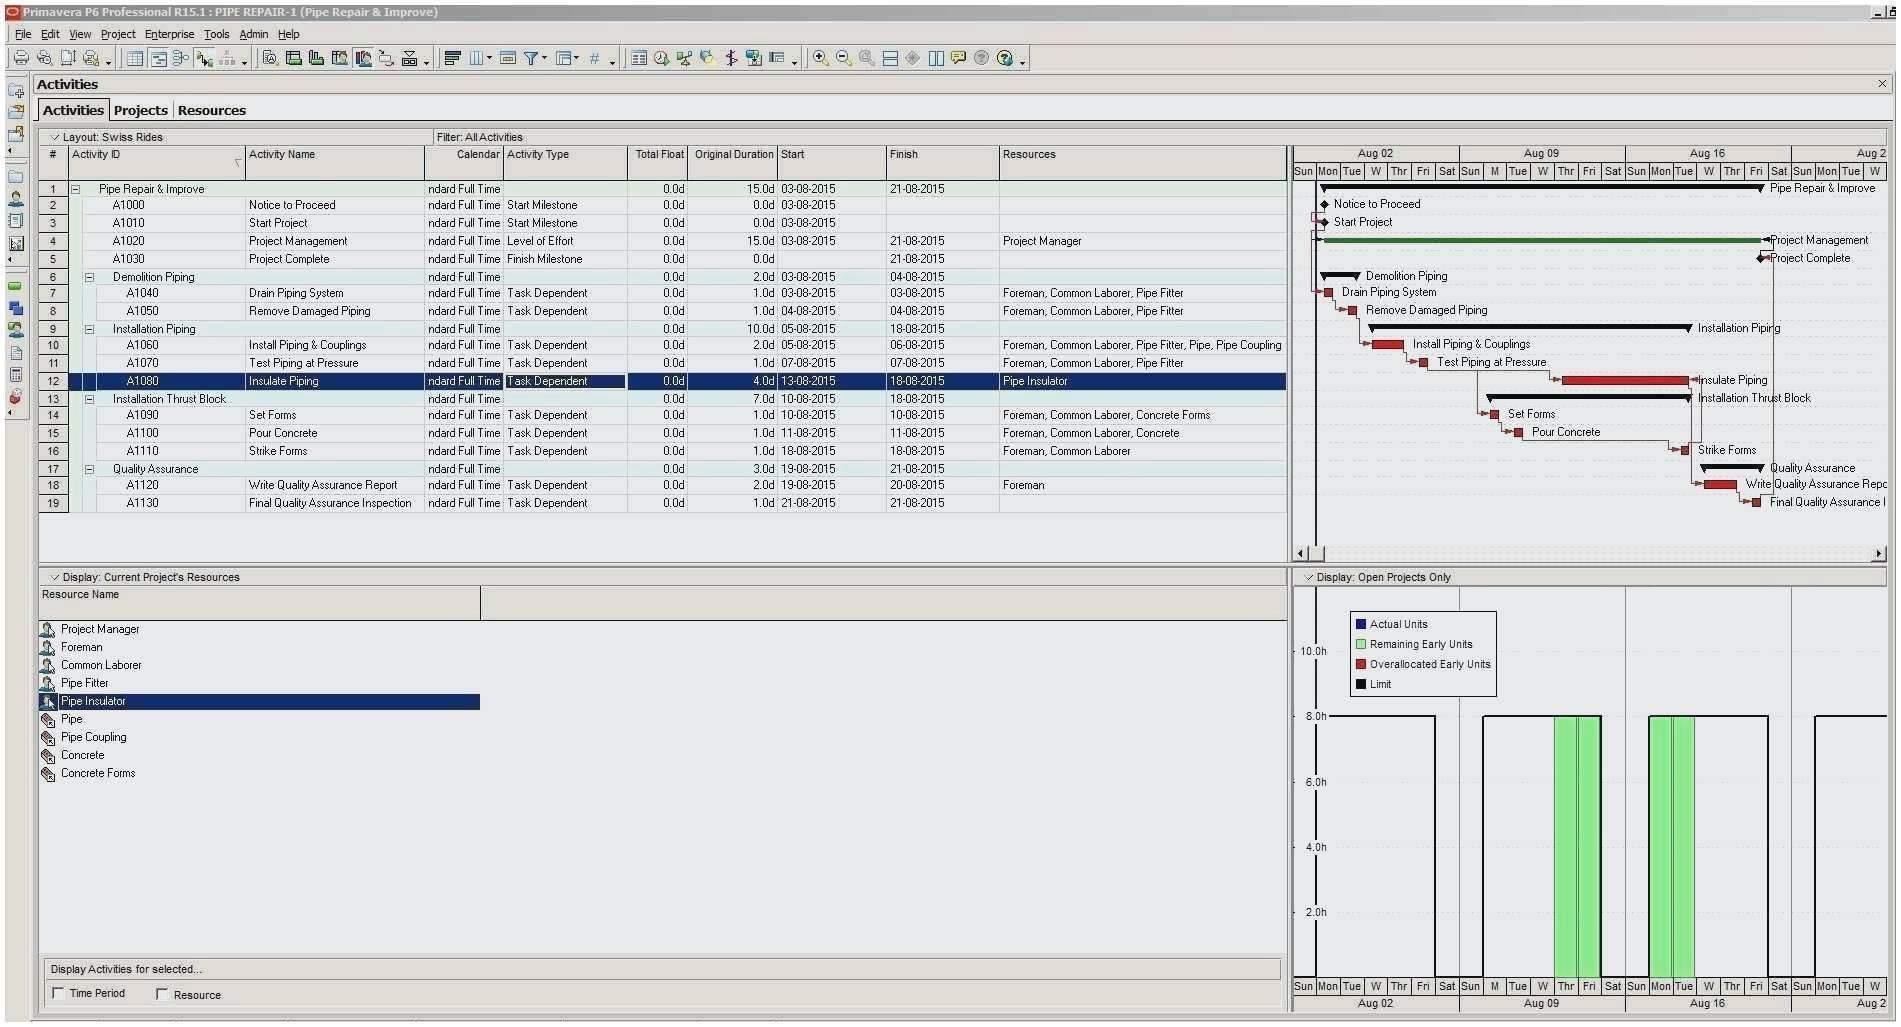 garten planen software kostenlos genial 33 neu gartengestaltung software pic of garten planen software kostenlos